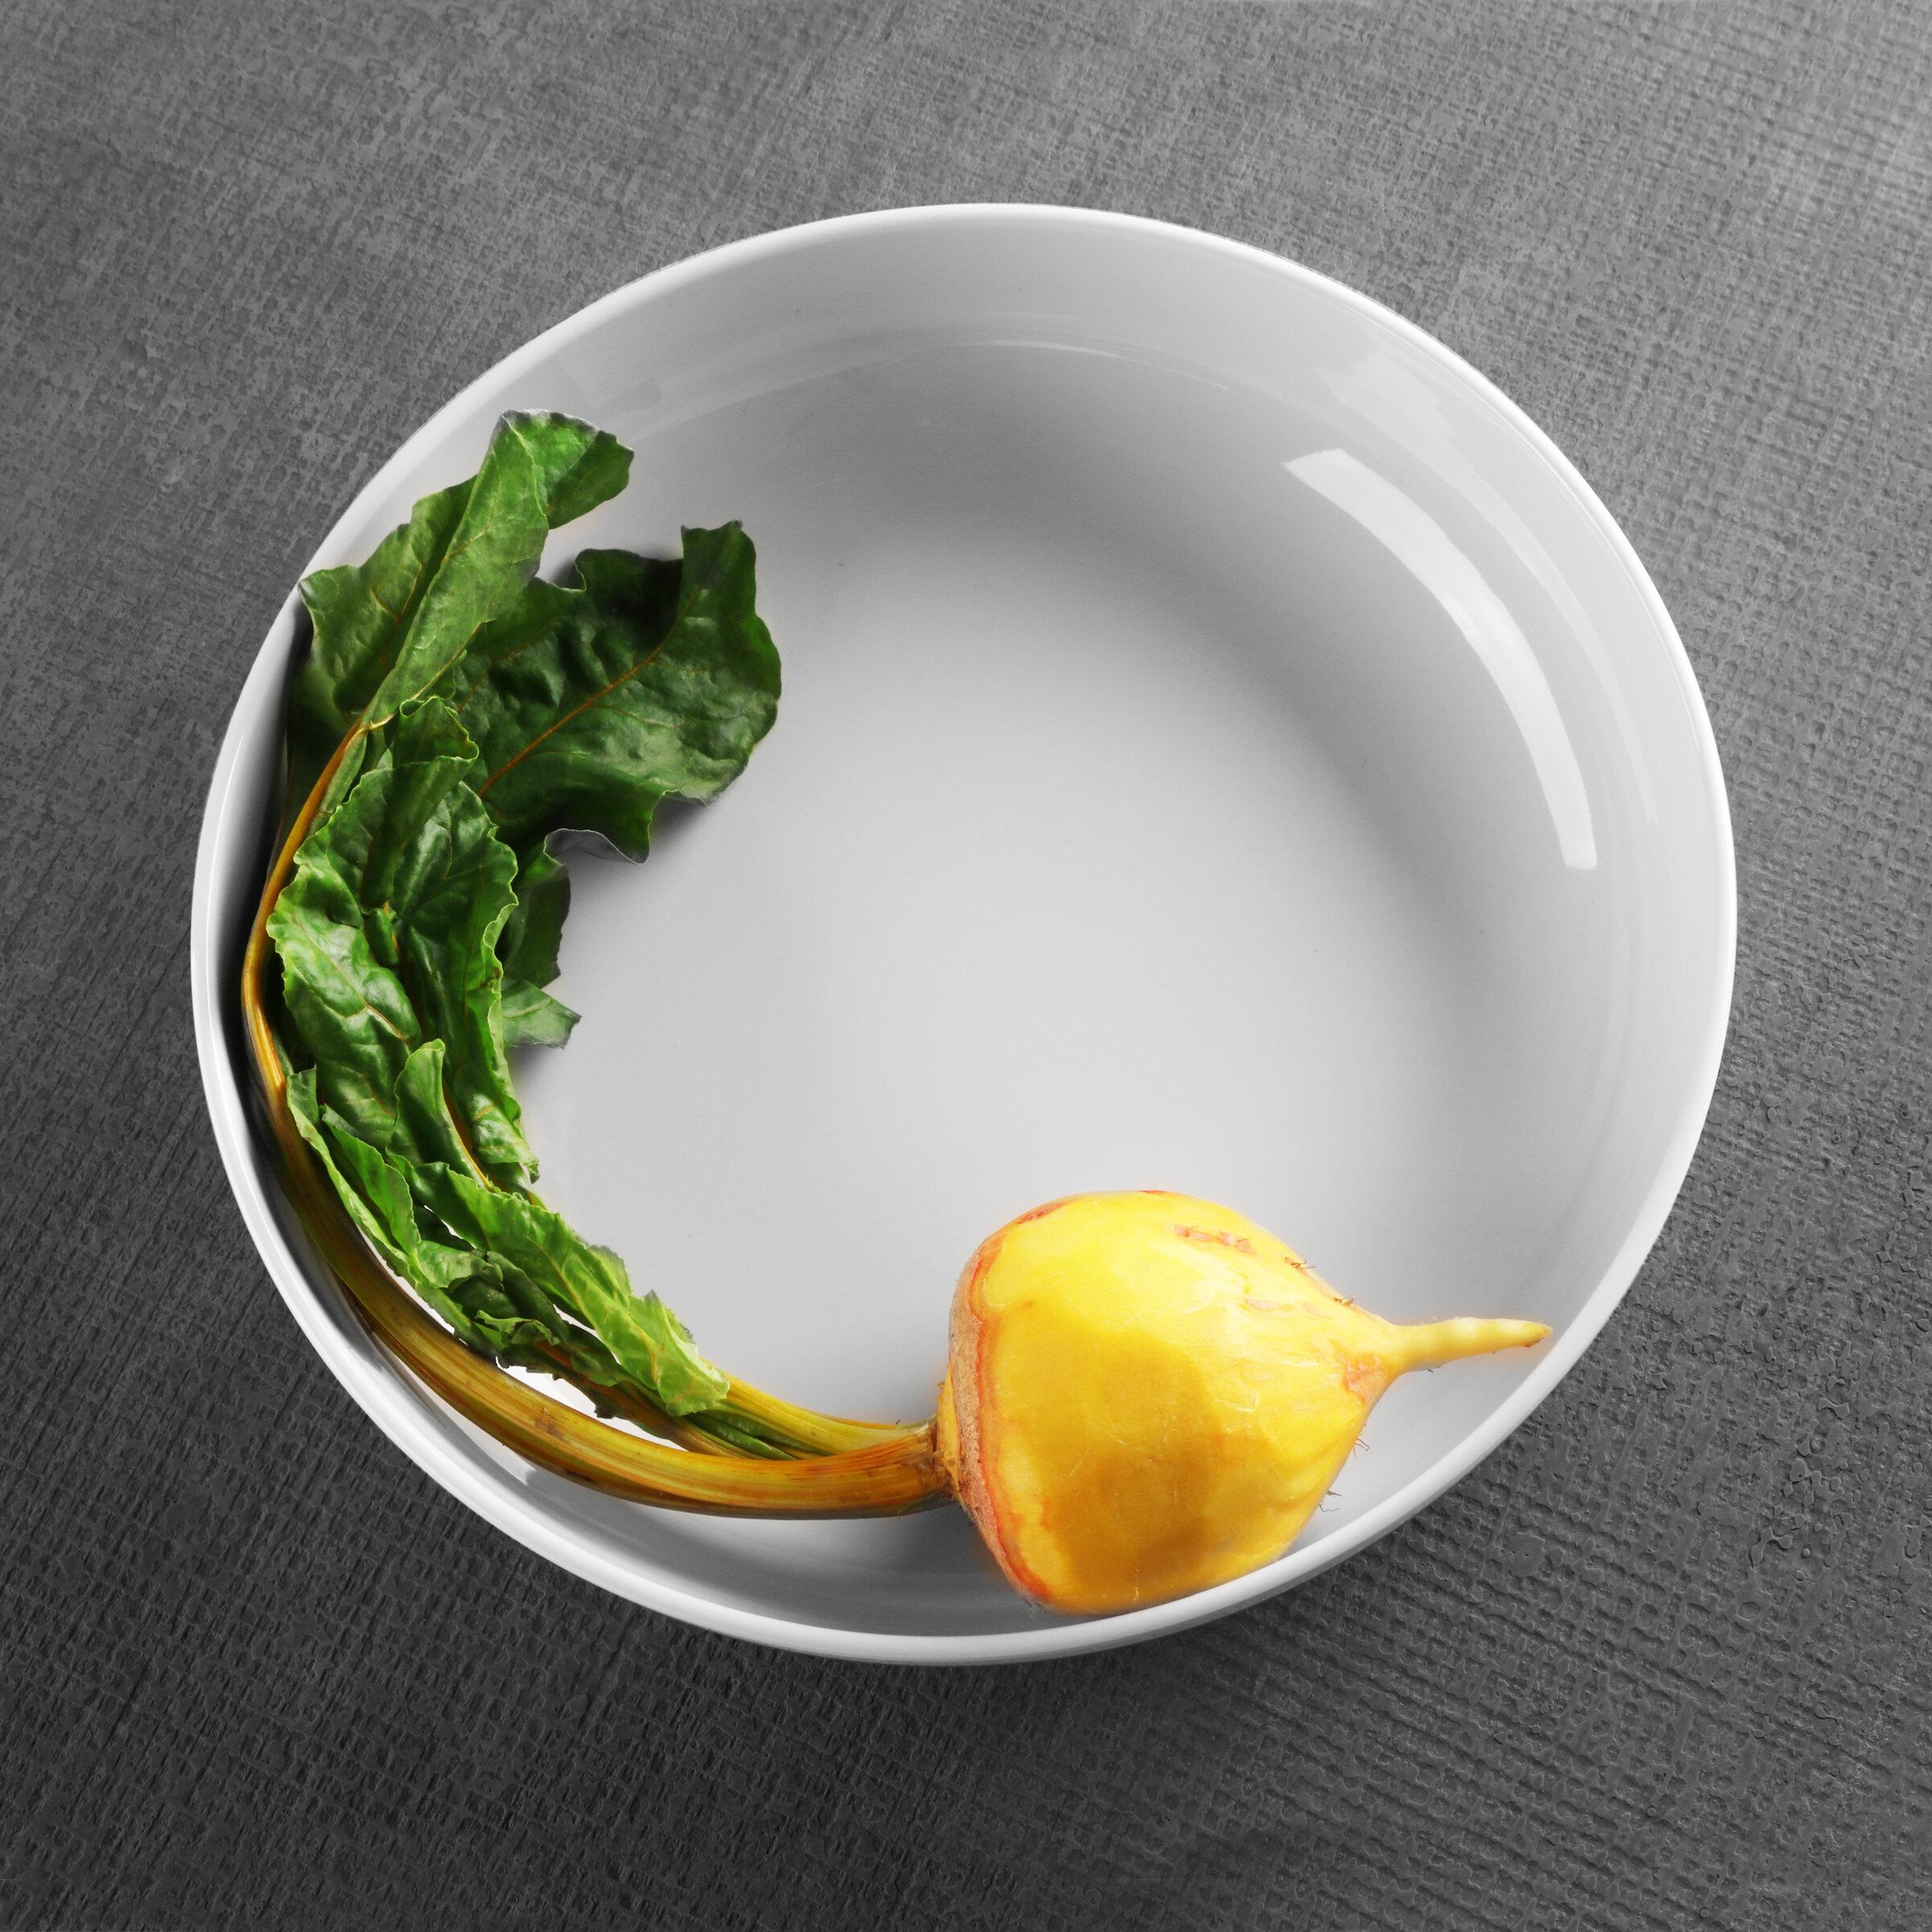 Elite Global Solutions Santorini 43 Oz Round Melamine Pasta Bowl Reviews Wayfair